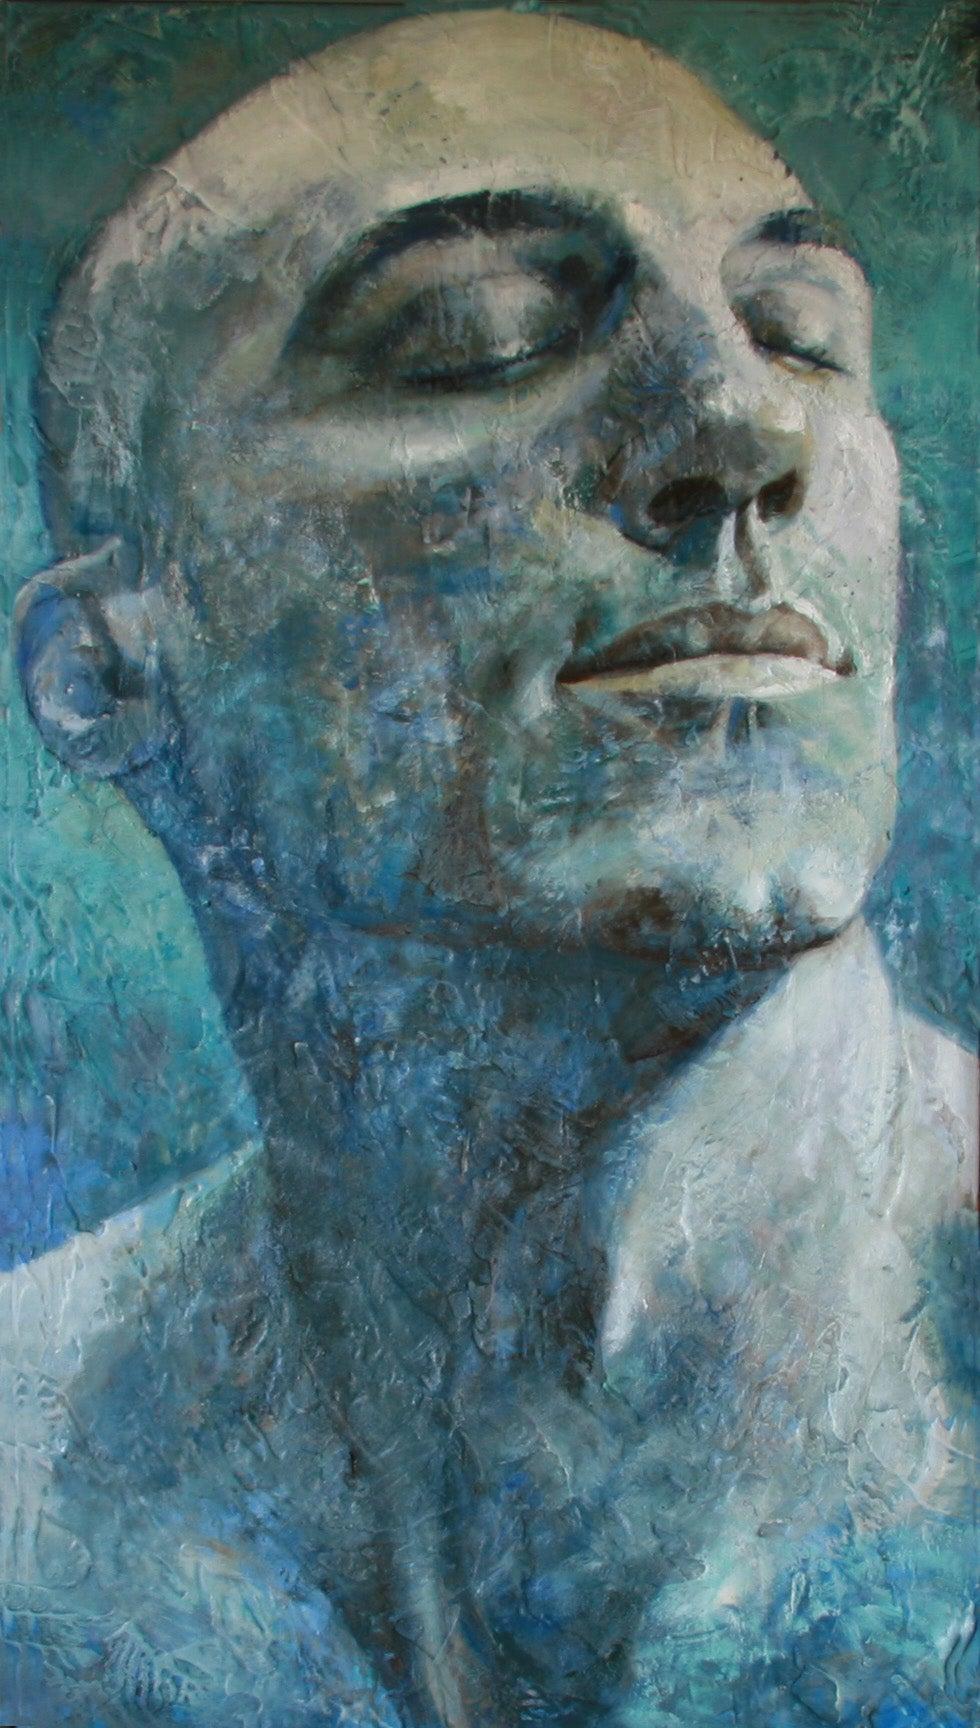 11-4-11 - 21st Century, Contemporary, Portrait Painting, Oil on Canvas